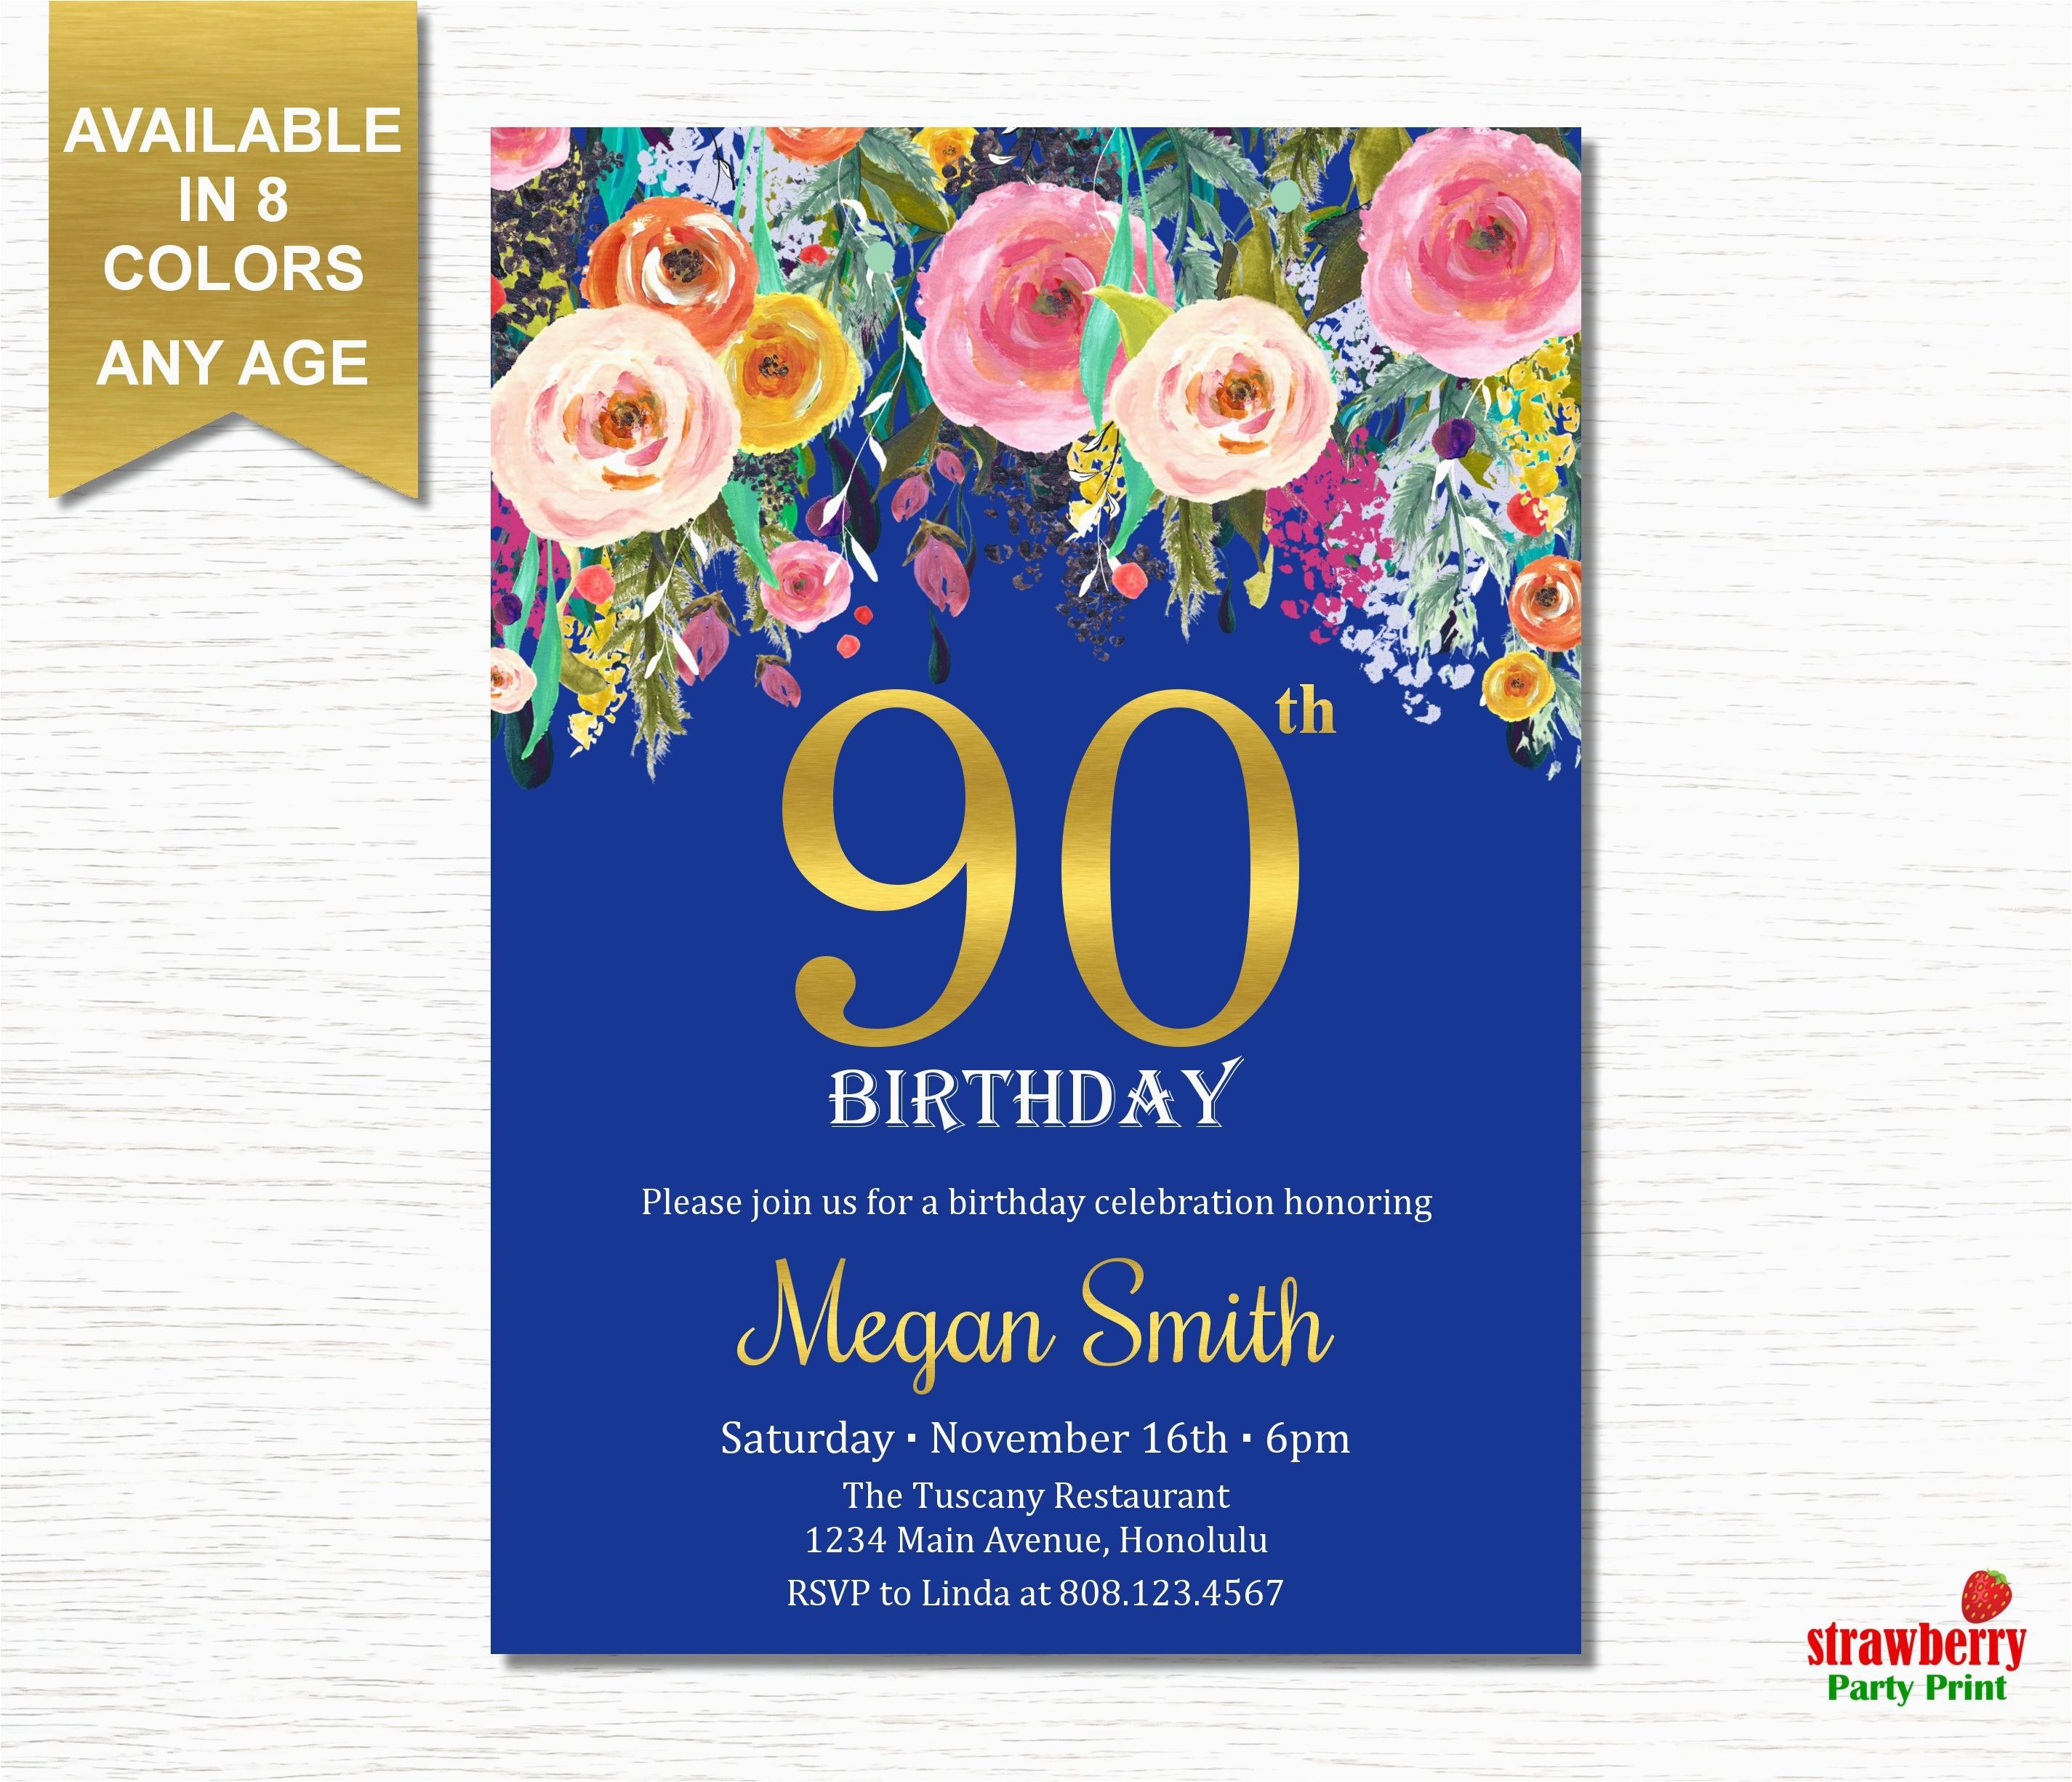 costco birthday invitation cards new luau birthday